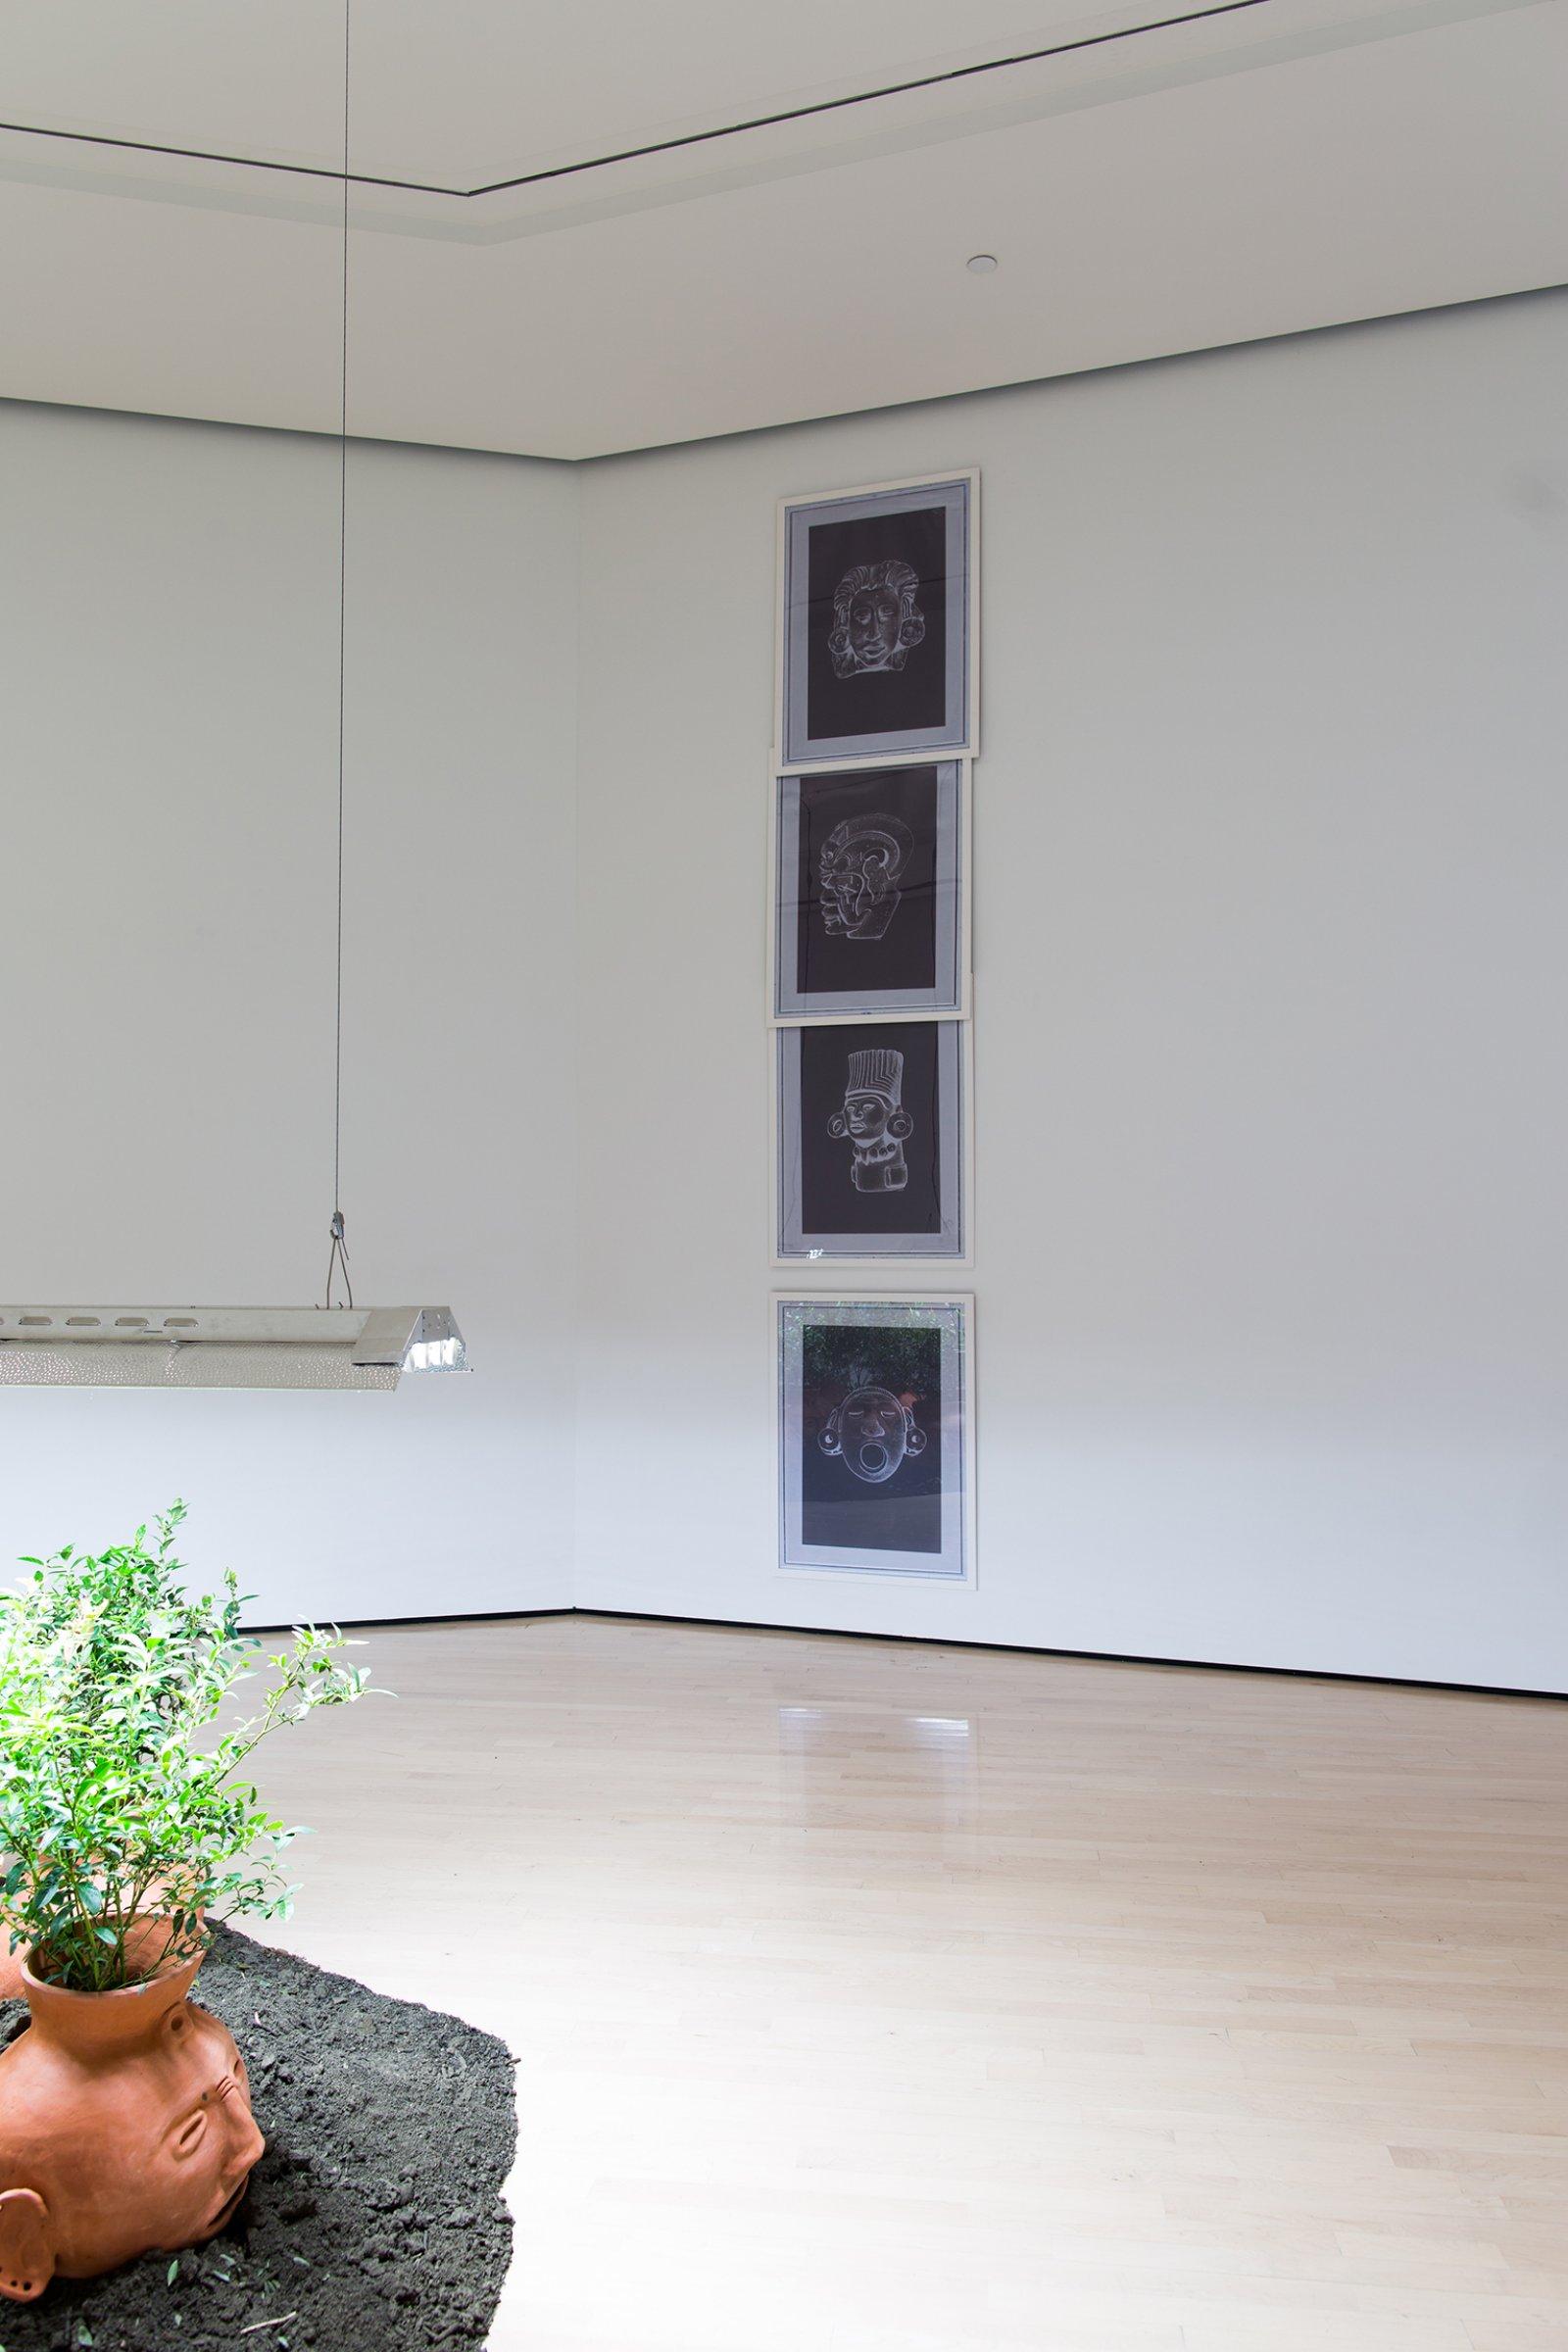 Duane Linkater, CALL 82, 2017, 4 framed digital prints, each 38 x 28 in. (97 x 71 cm). Installation view, Field Station: Duane Linklater, MSU Broad, East Lansing, MI, 2017 by Duane Linklater